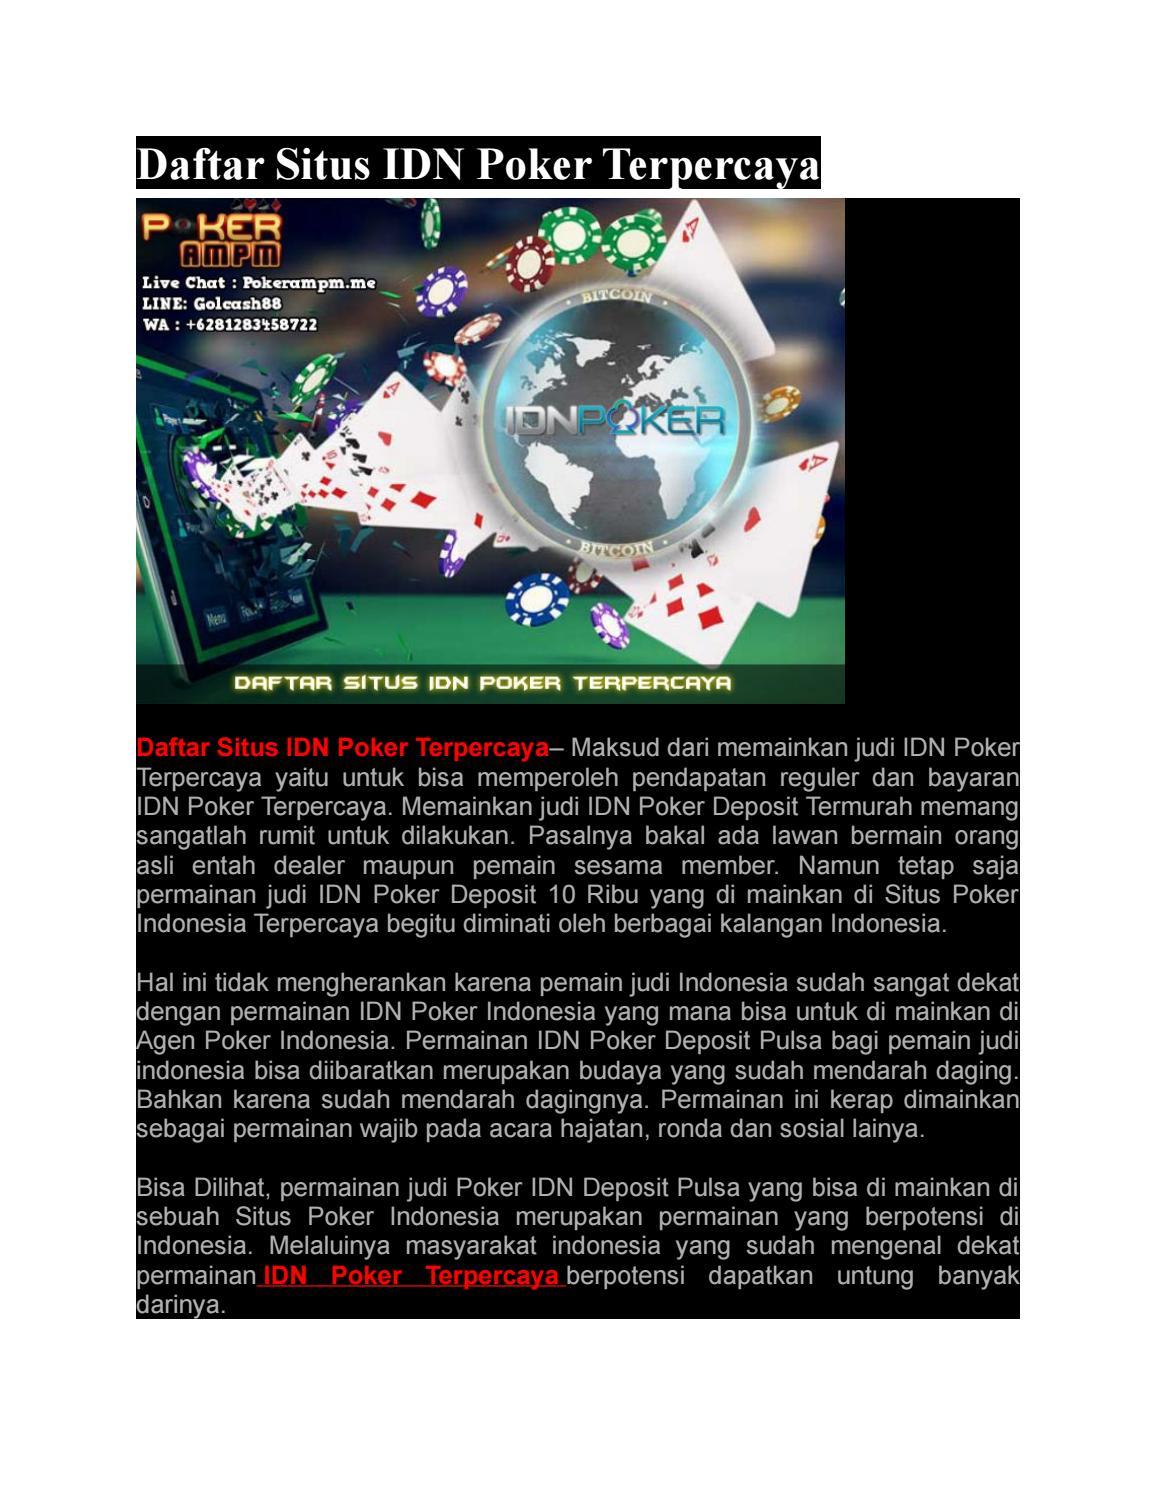 Idn Poker Ampm